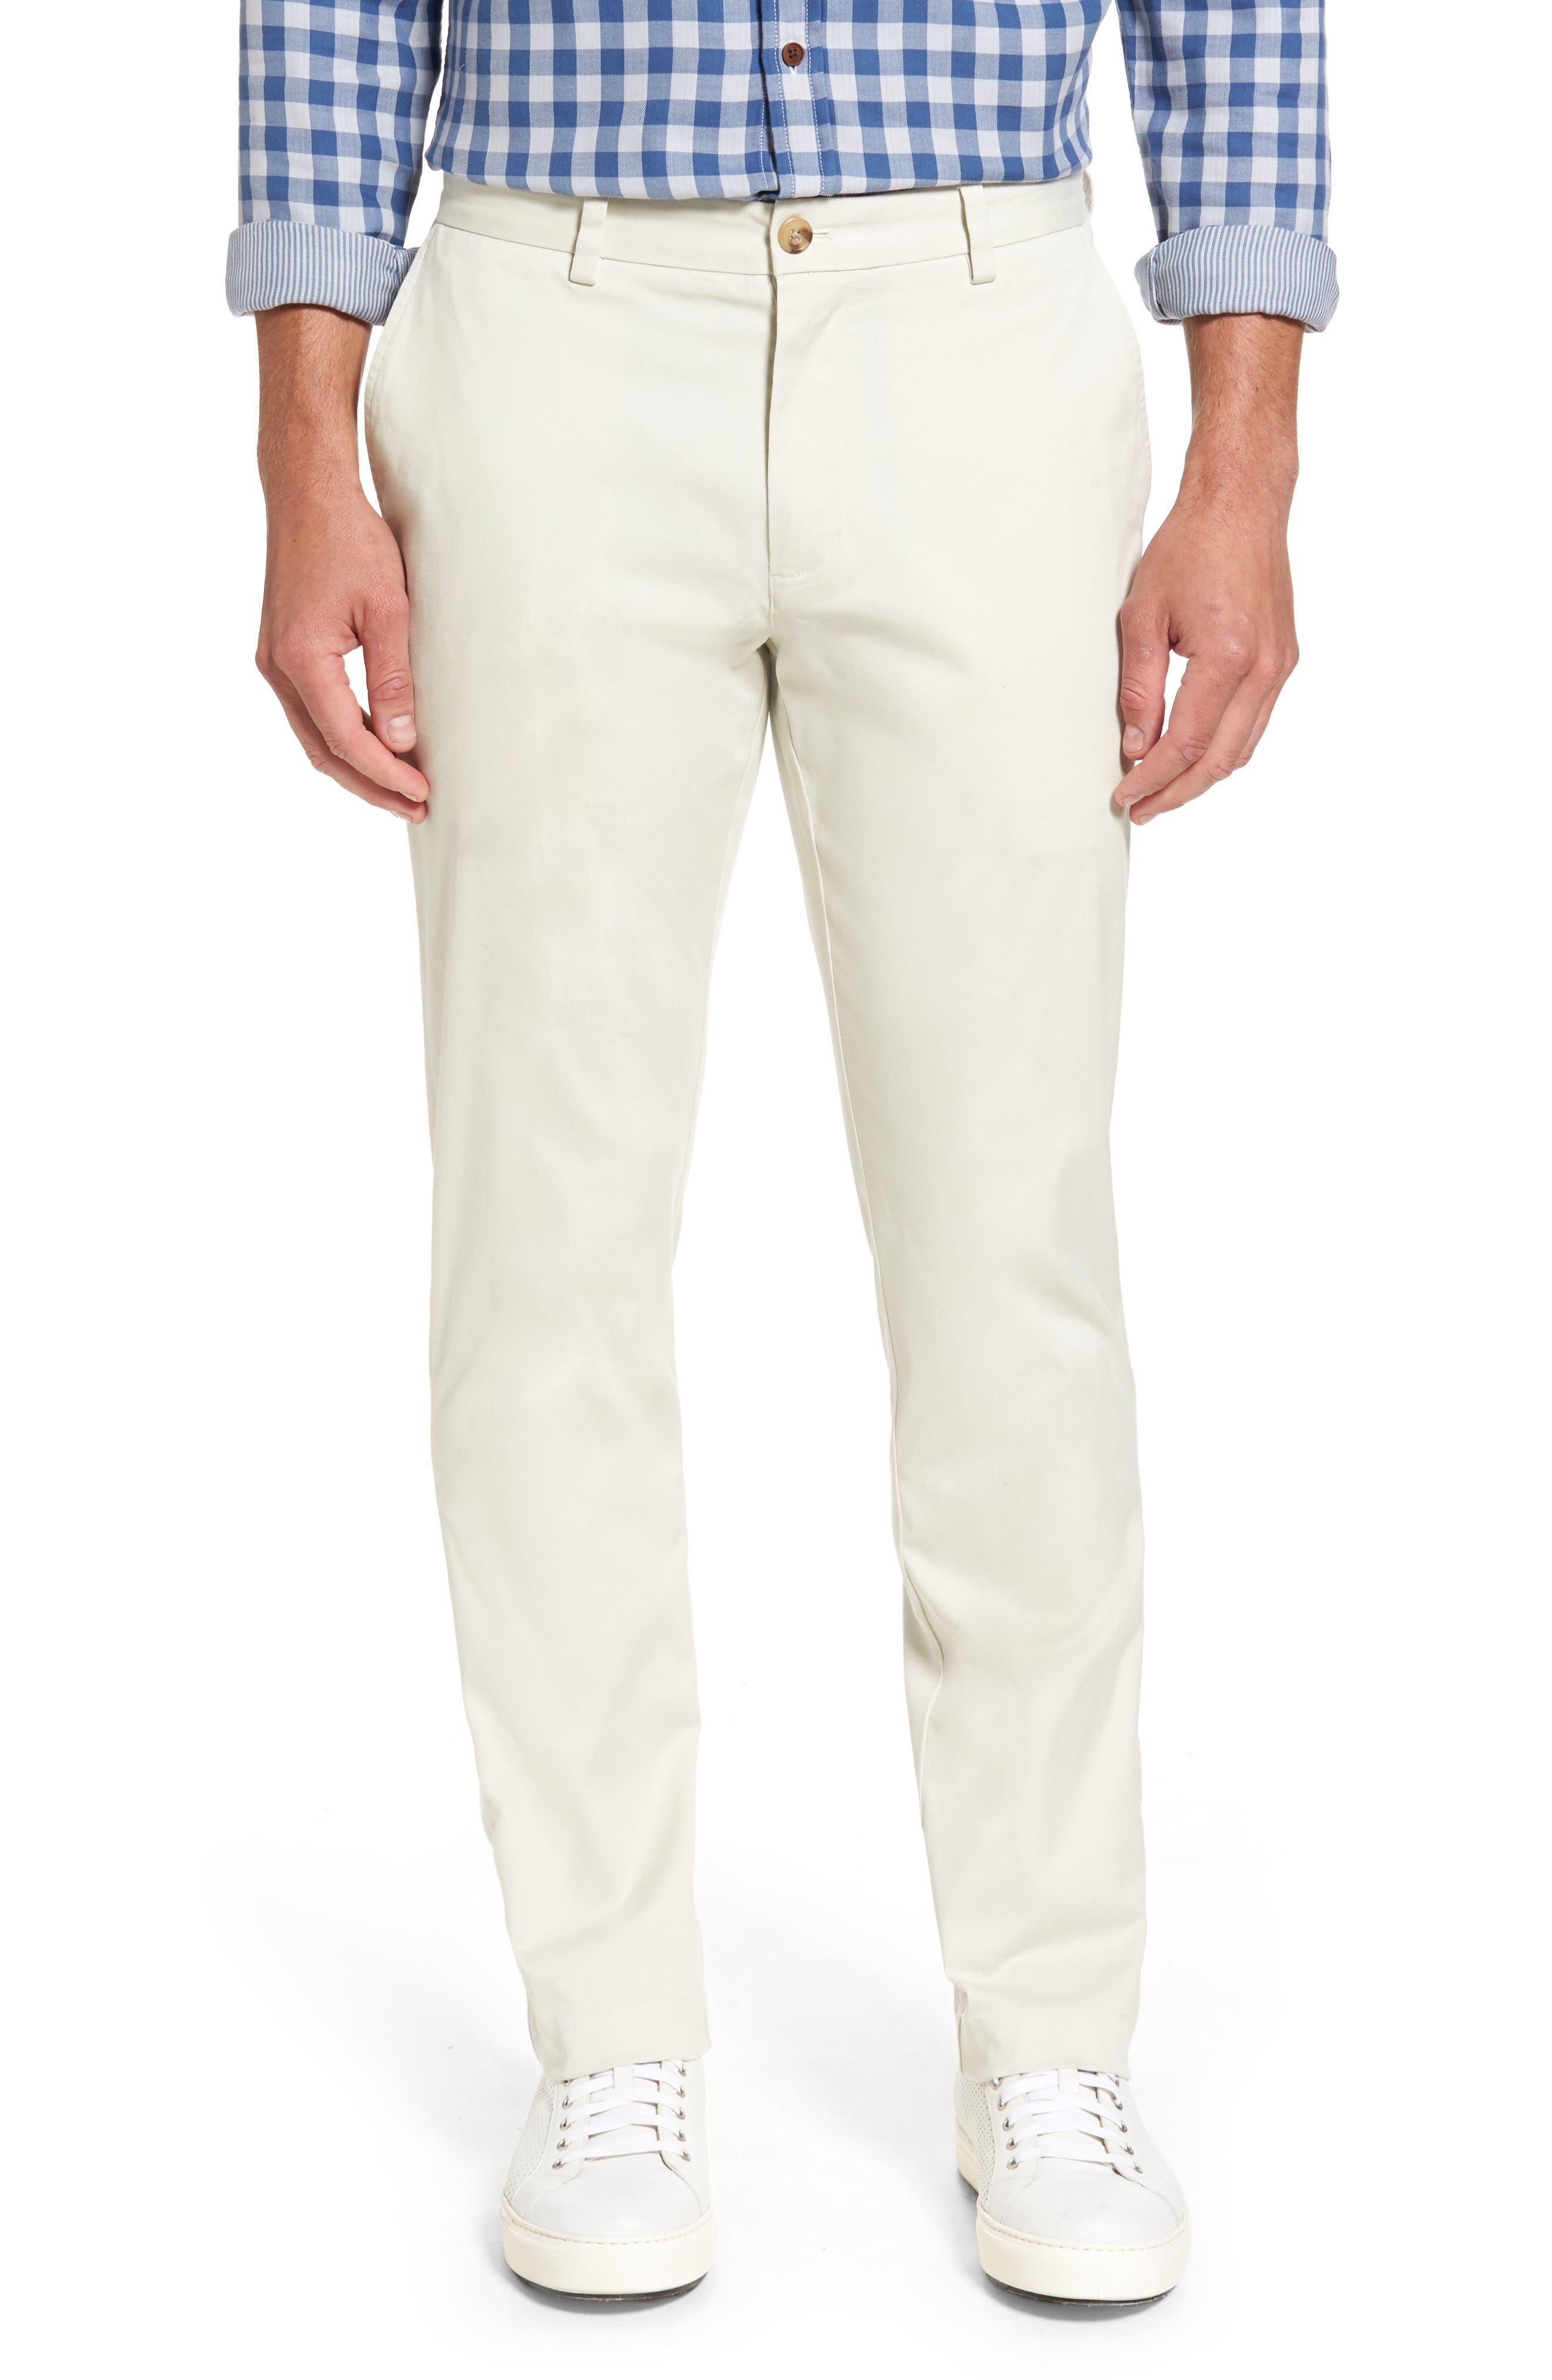 Breaker Flat Front Stretch Cotton Pants,                         Main,                         color, Stone